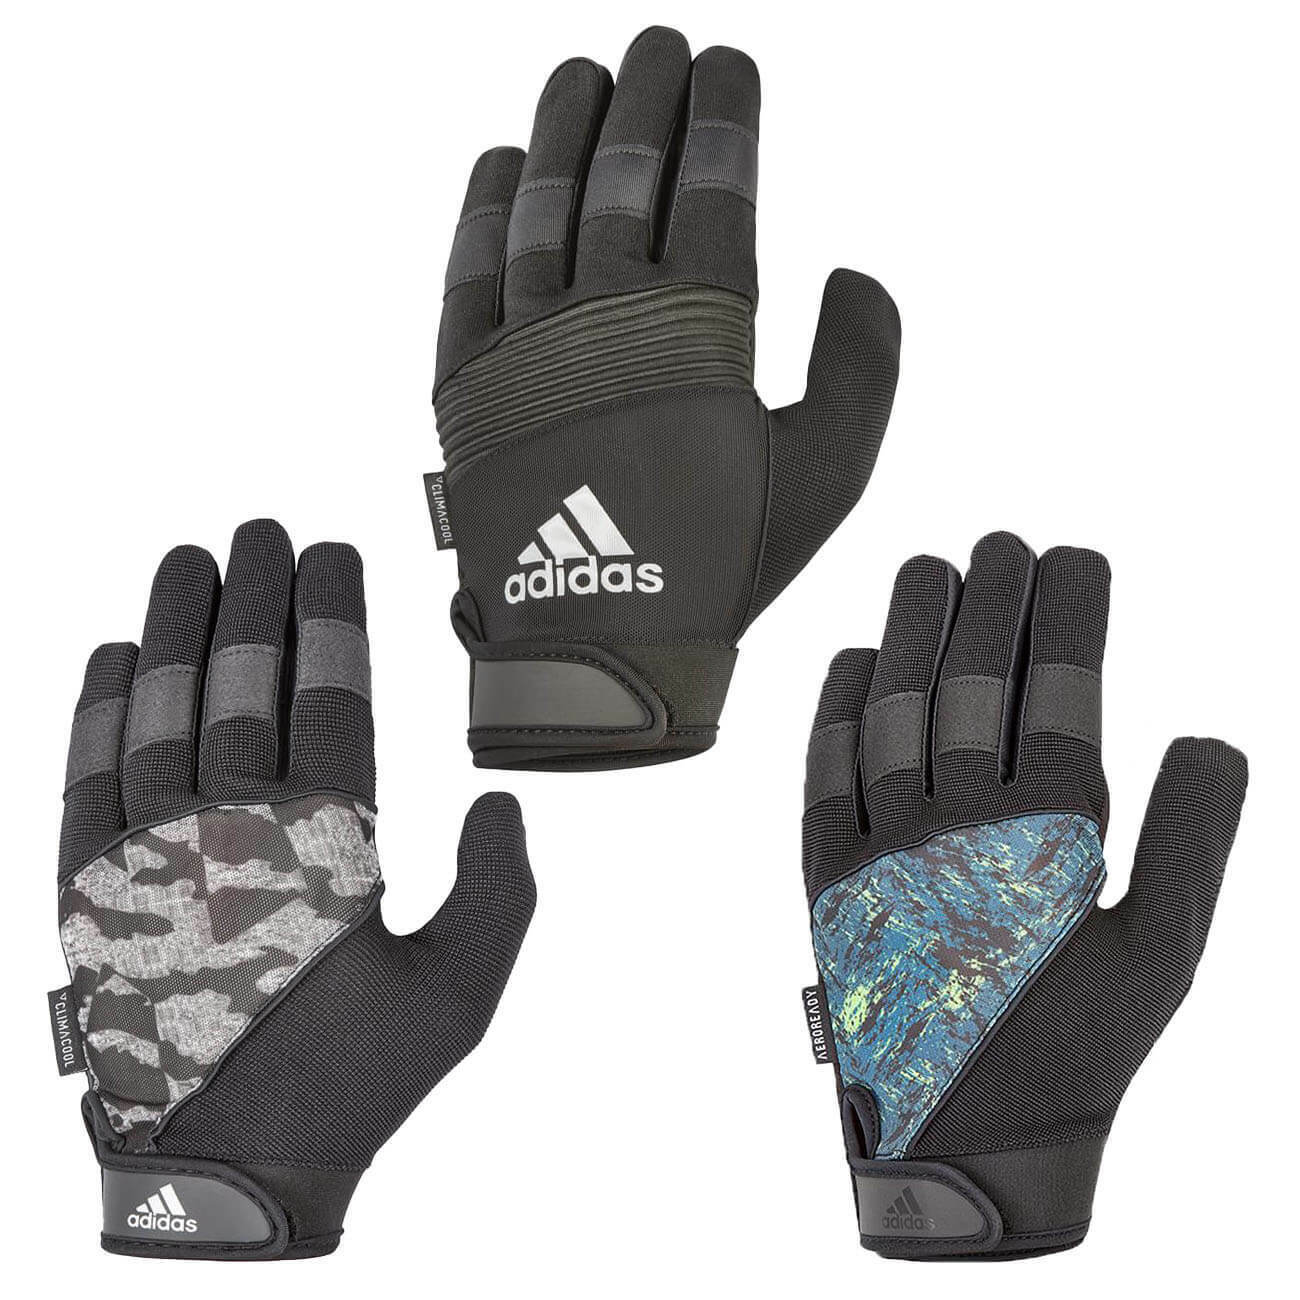 violencia tifón Mendicidad  Adidas Full Finger Performance Weight Lifting Gloves Gym Bodybuilding  Workout   eBay